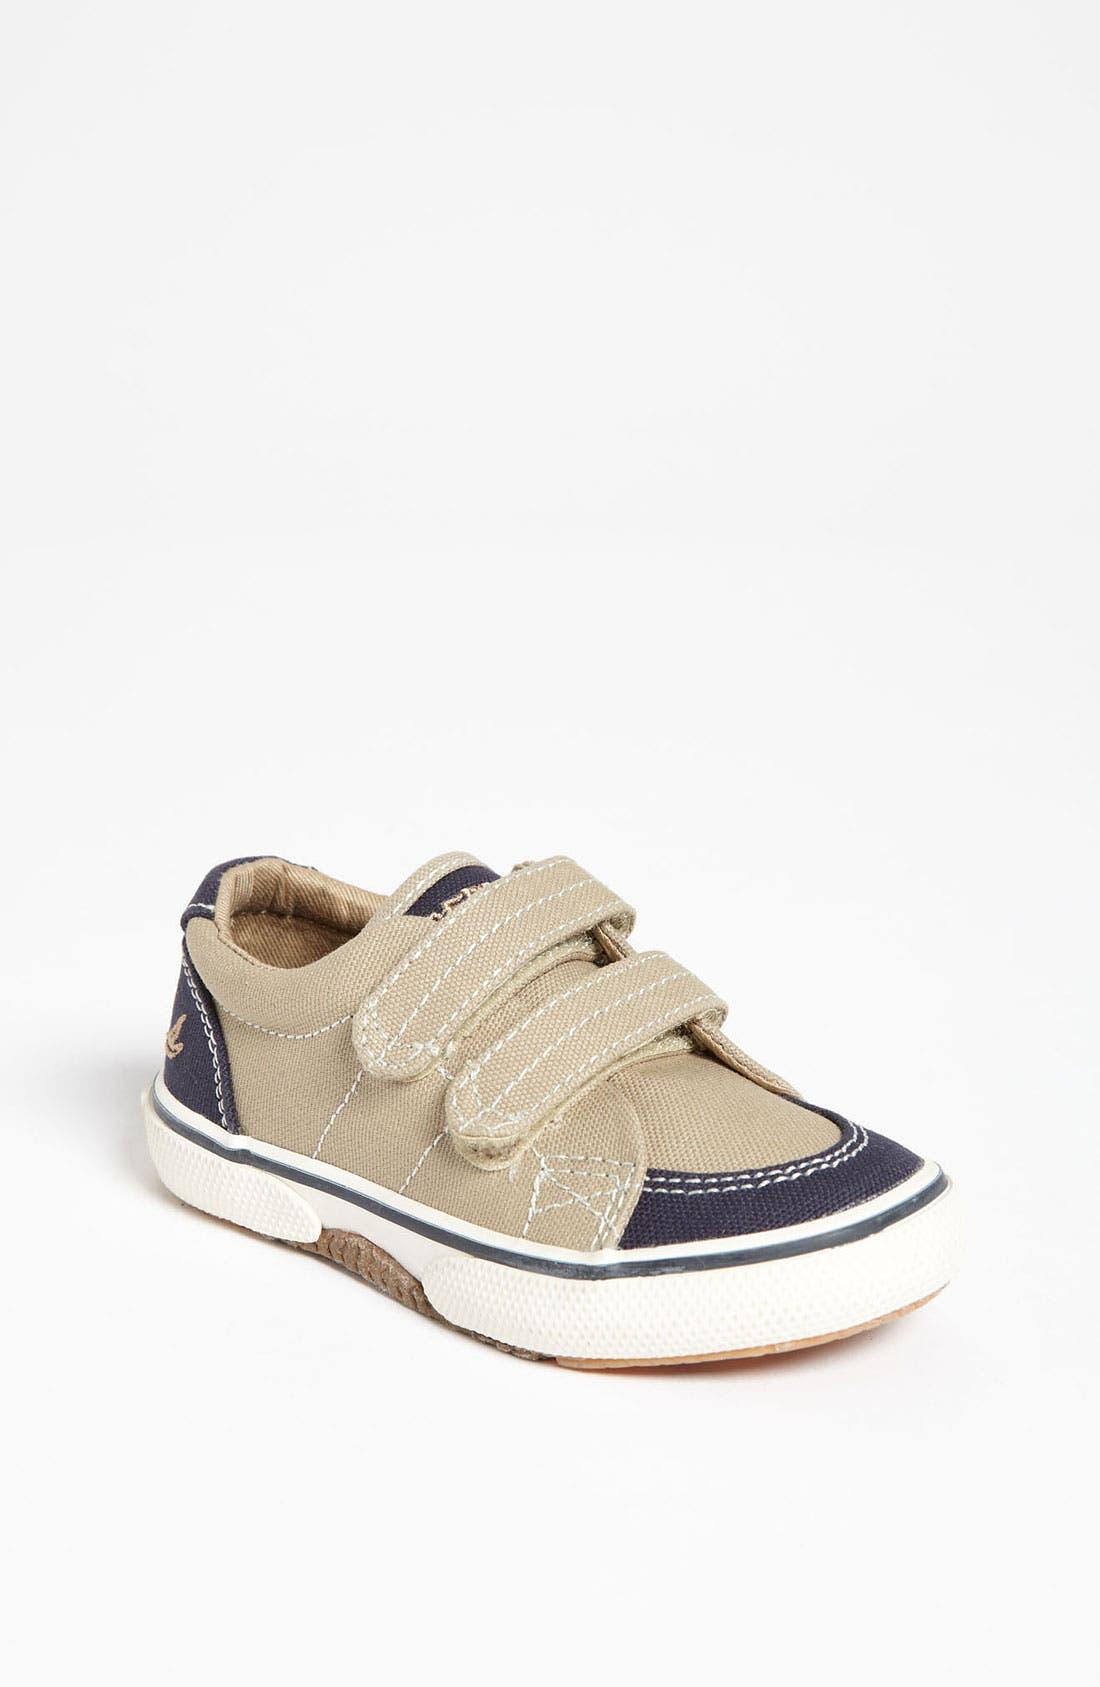 Alternate Image 1 Selected - Sperry Top-Sider® Kids 'Halyard' Sneaker (Walker & Toddler)